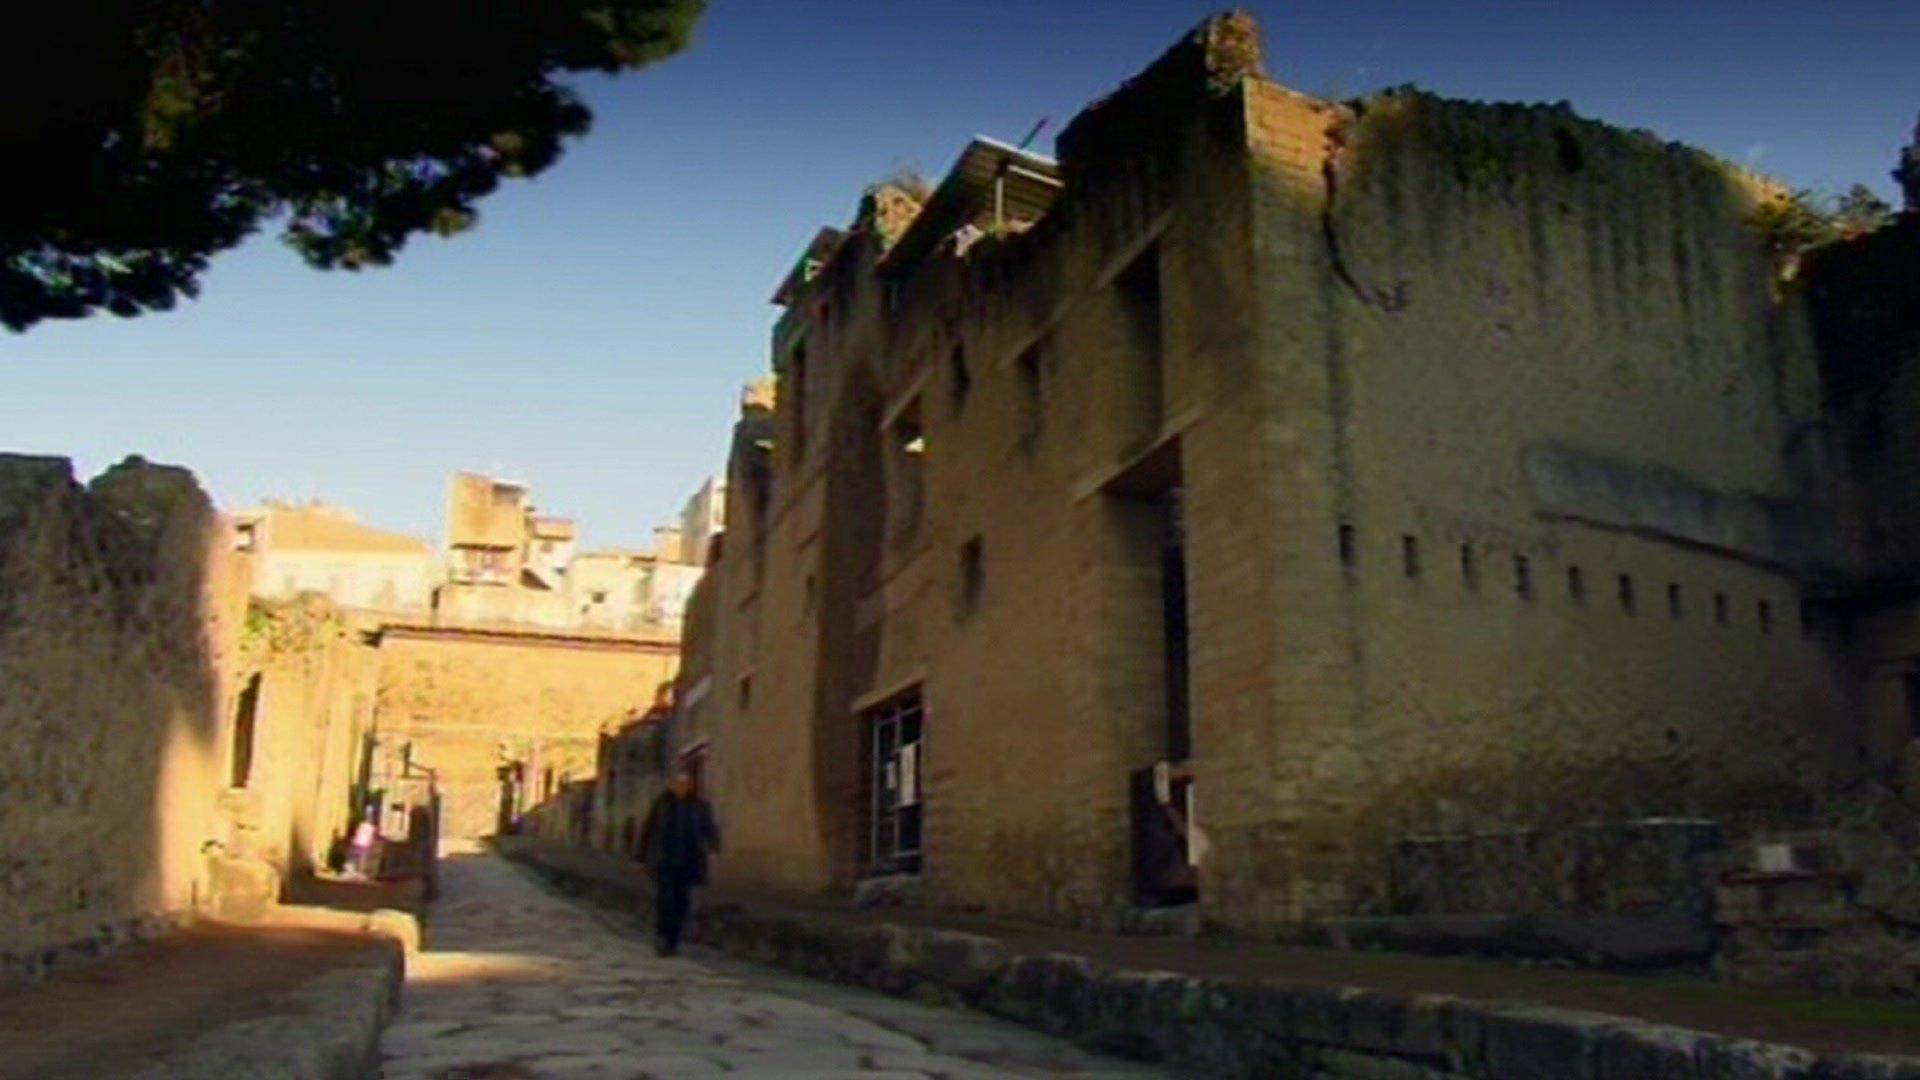 Building in Herculaneum